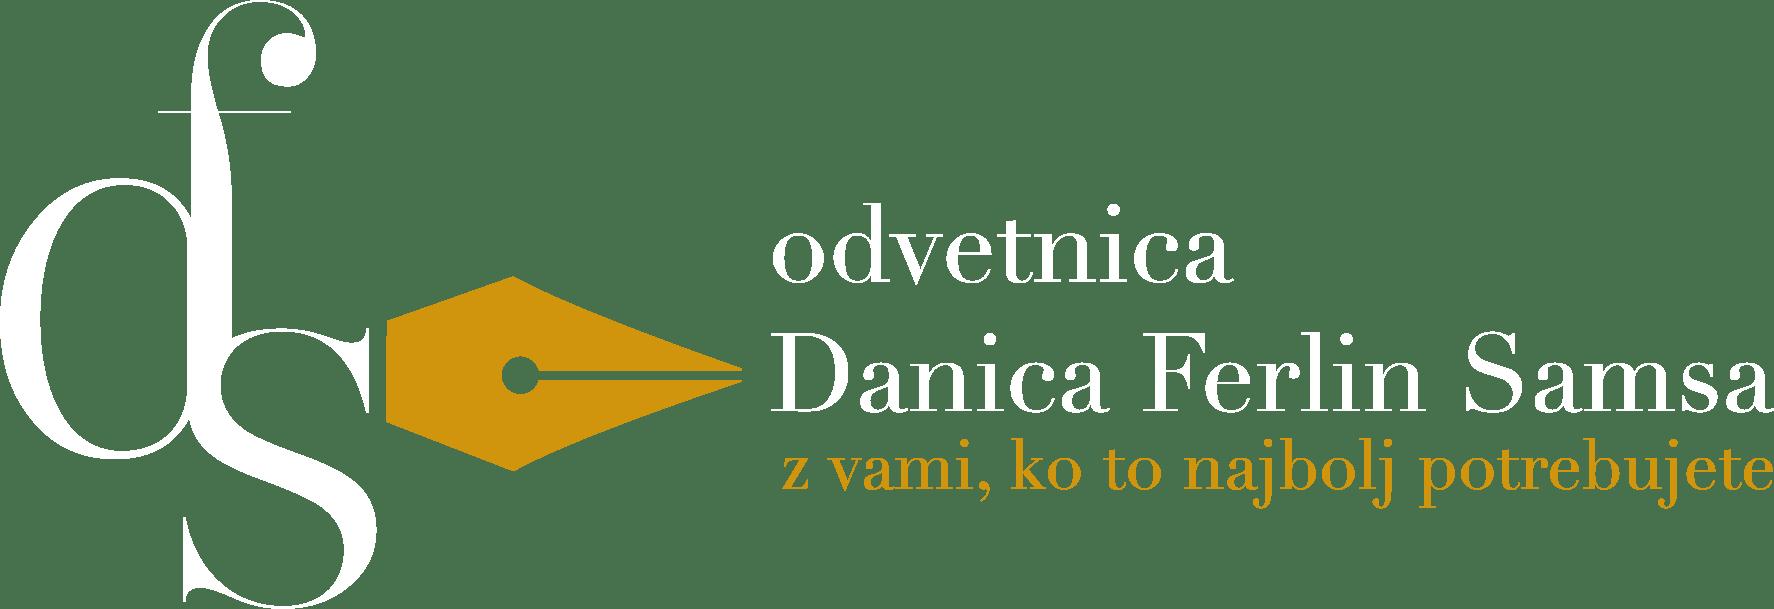 Odvetnica Danica Ferlin Samsa